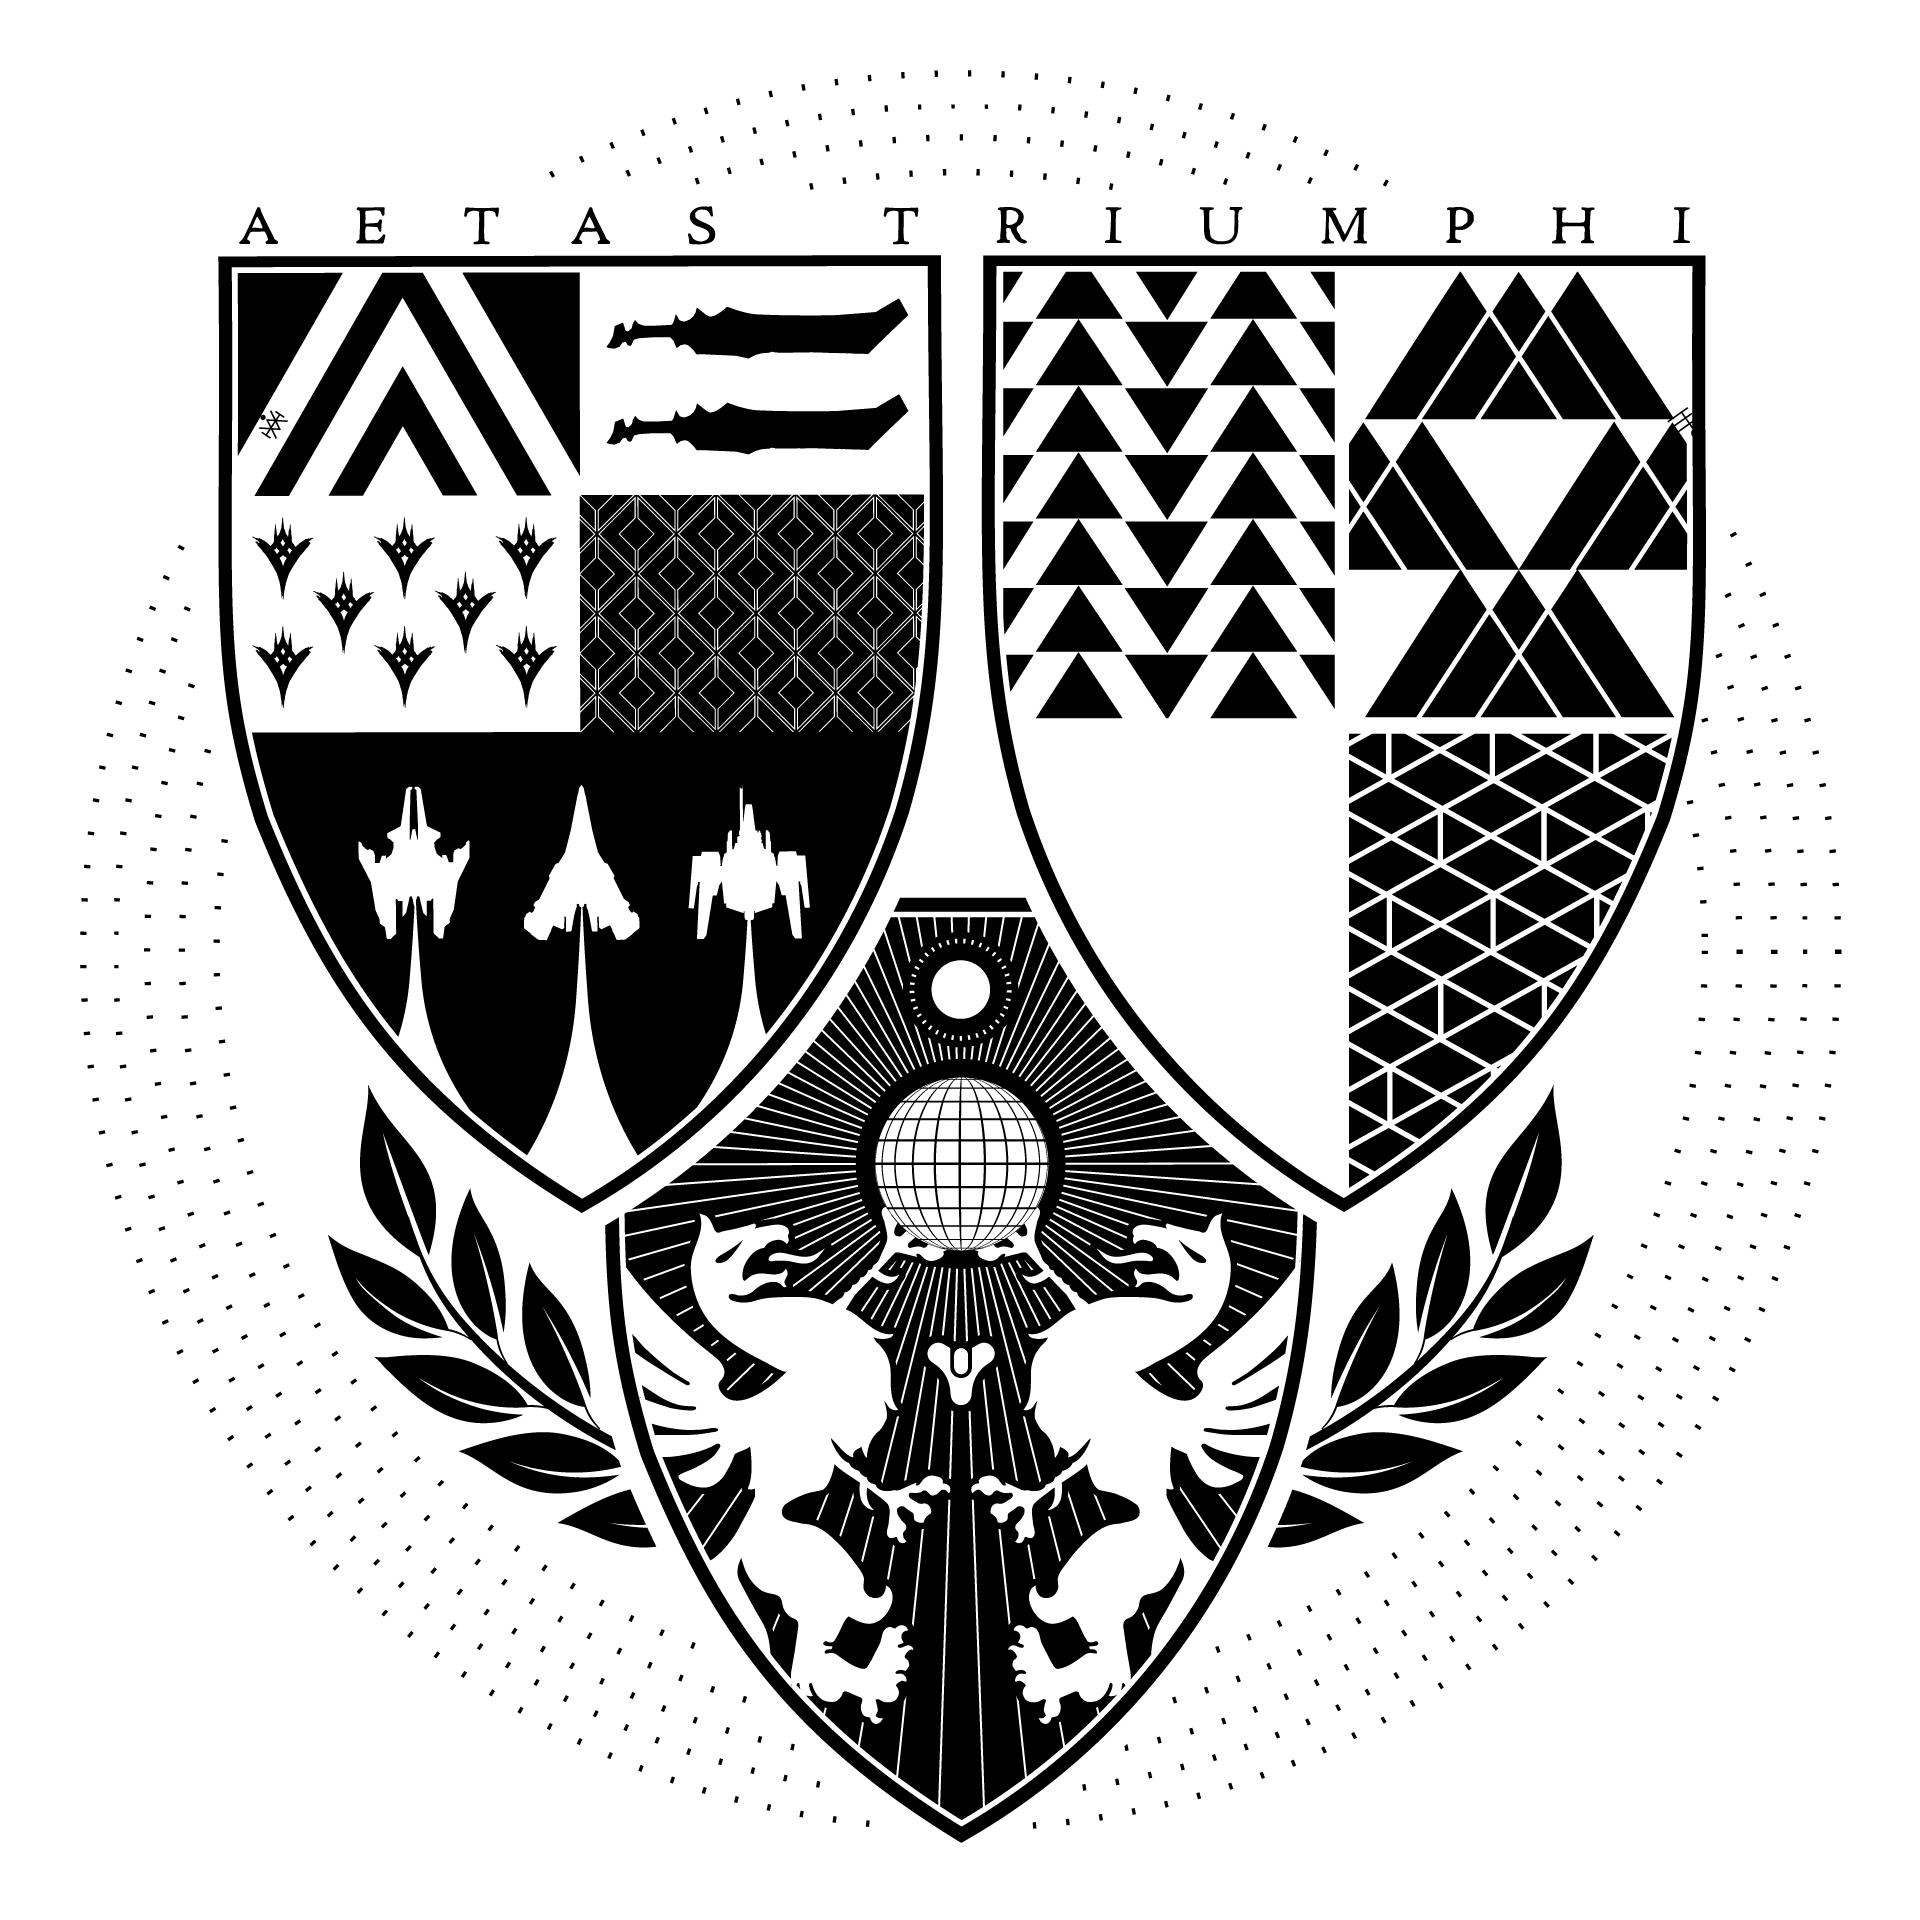 strange symbols in age of triumph logo - lore - commons